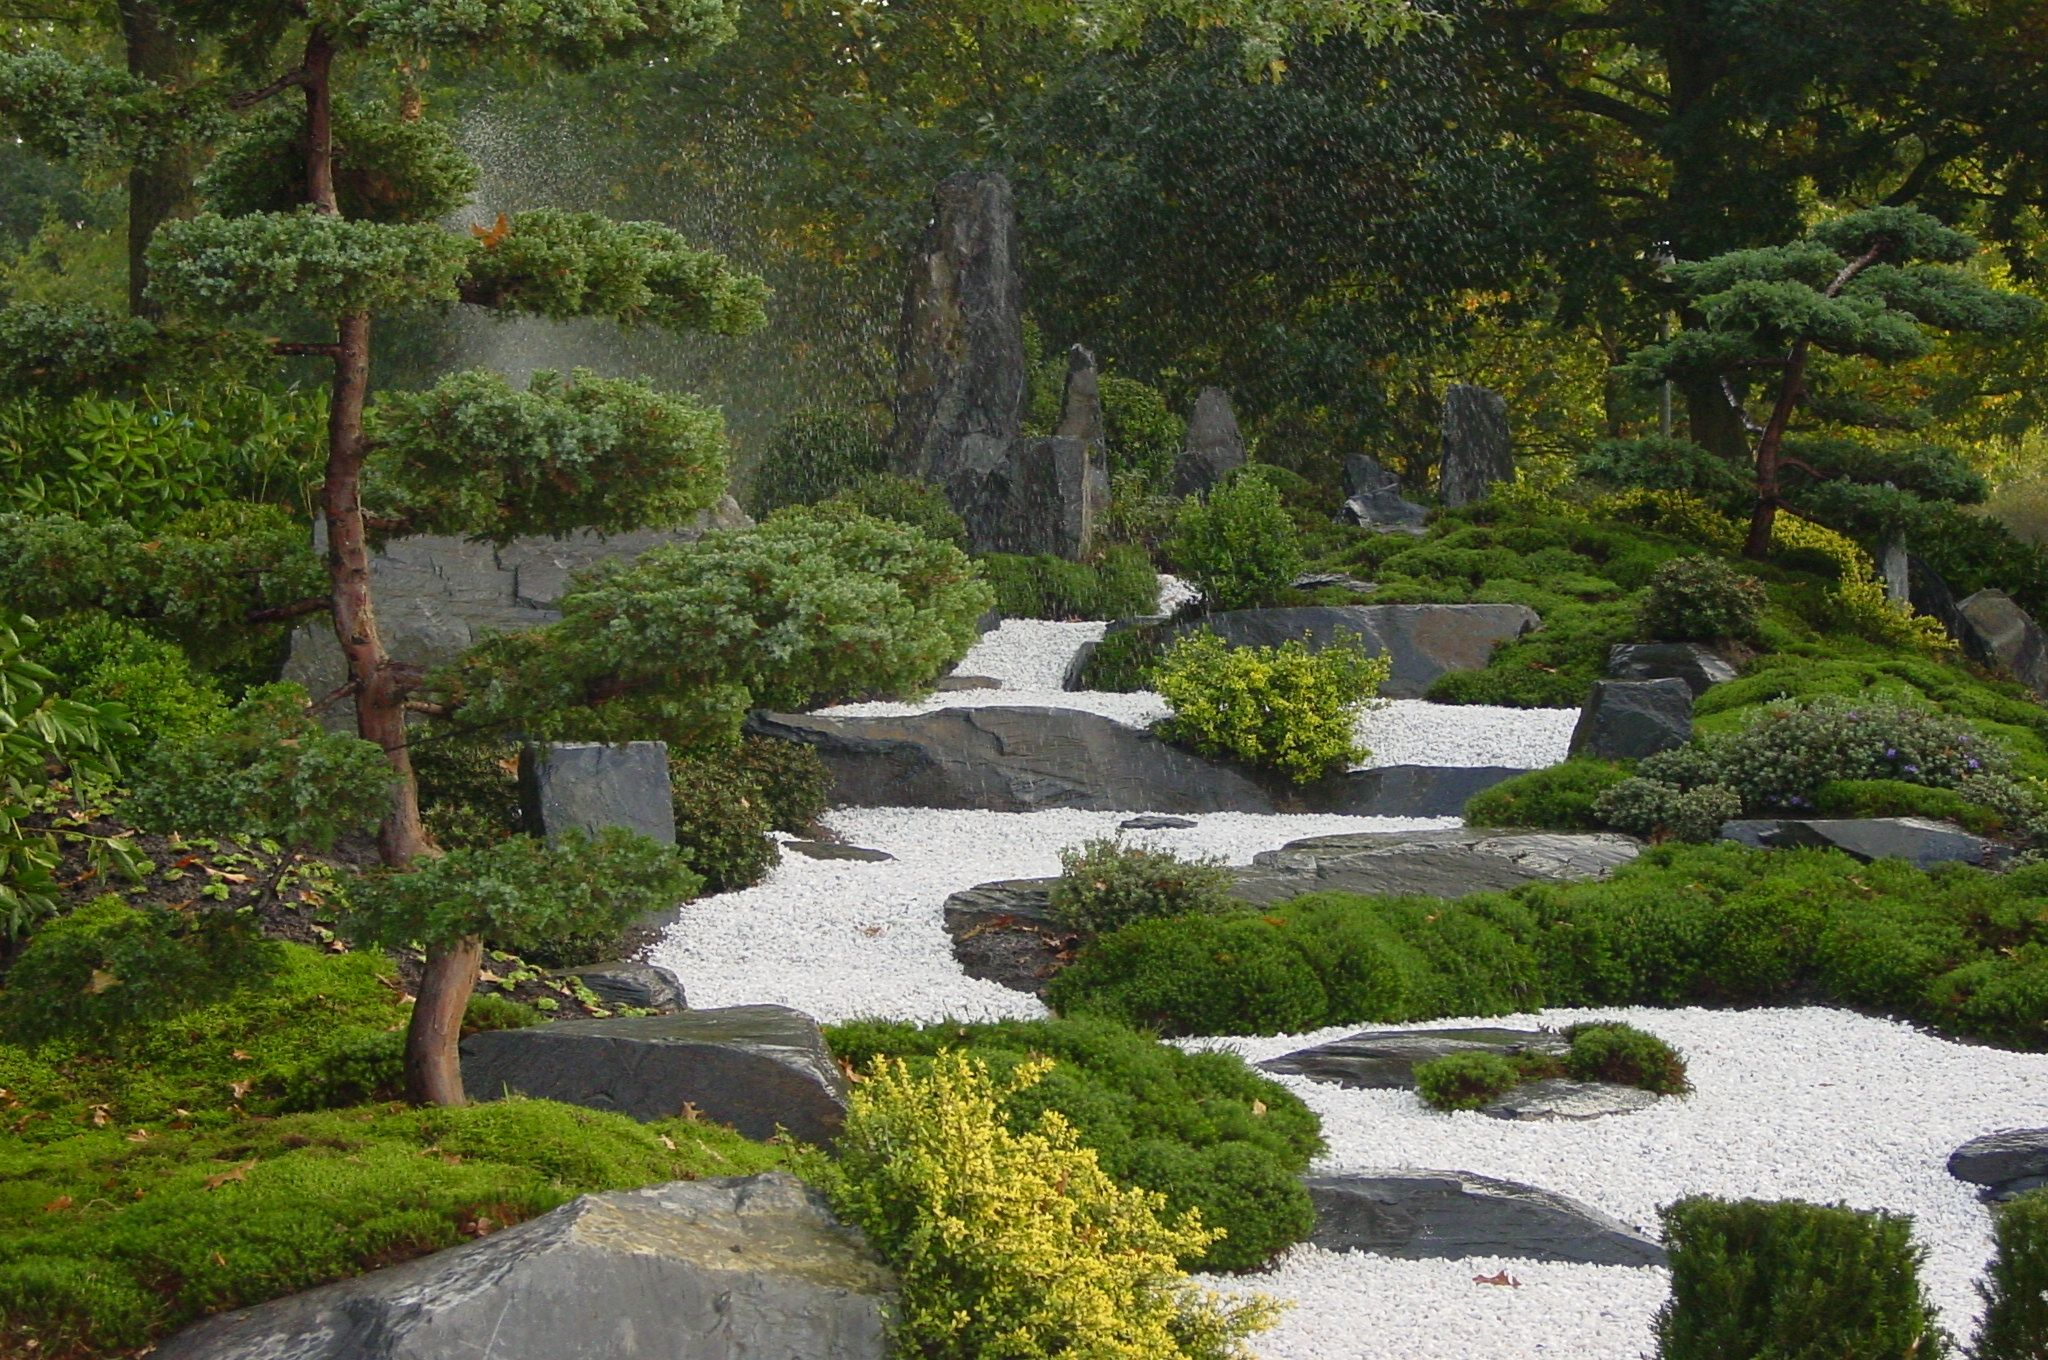 Gartendesign Von Japan Garten Kultur Japanischer Garten Garten Asia Garten